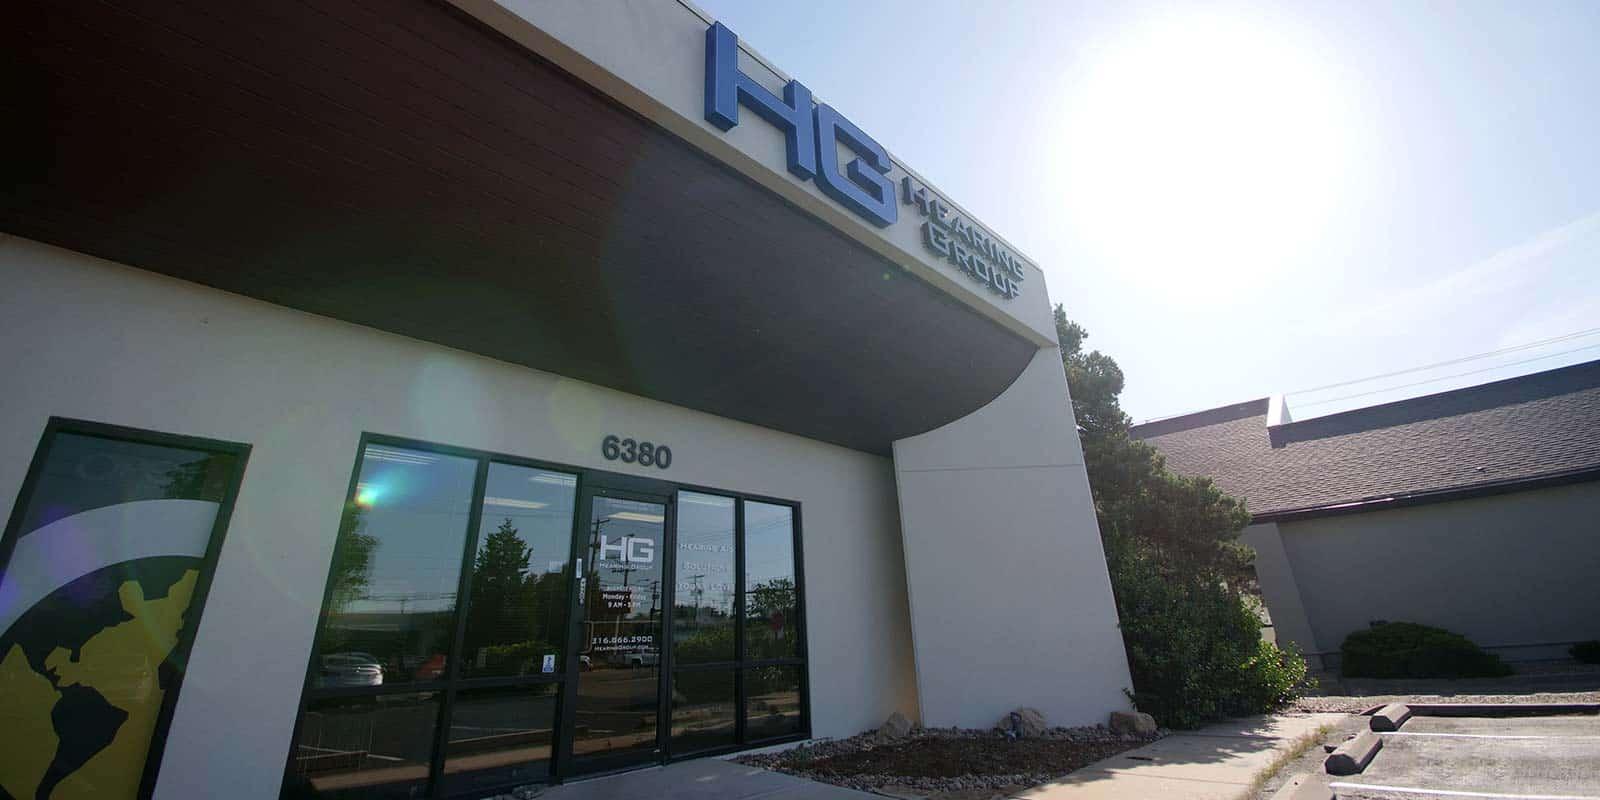 Hearing Aids Wichita, KS Office East